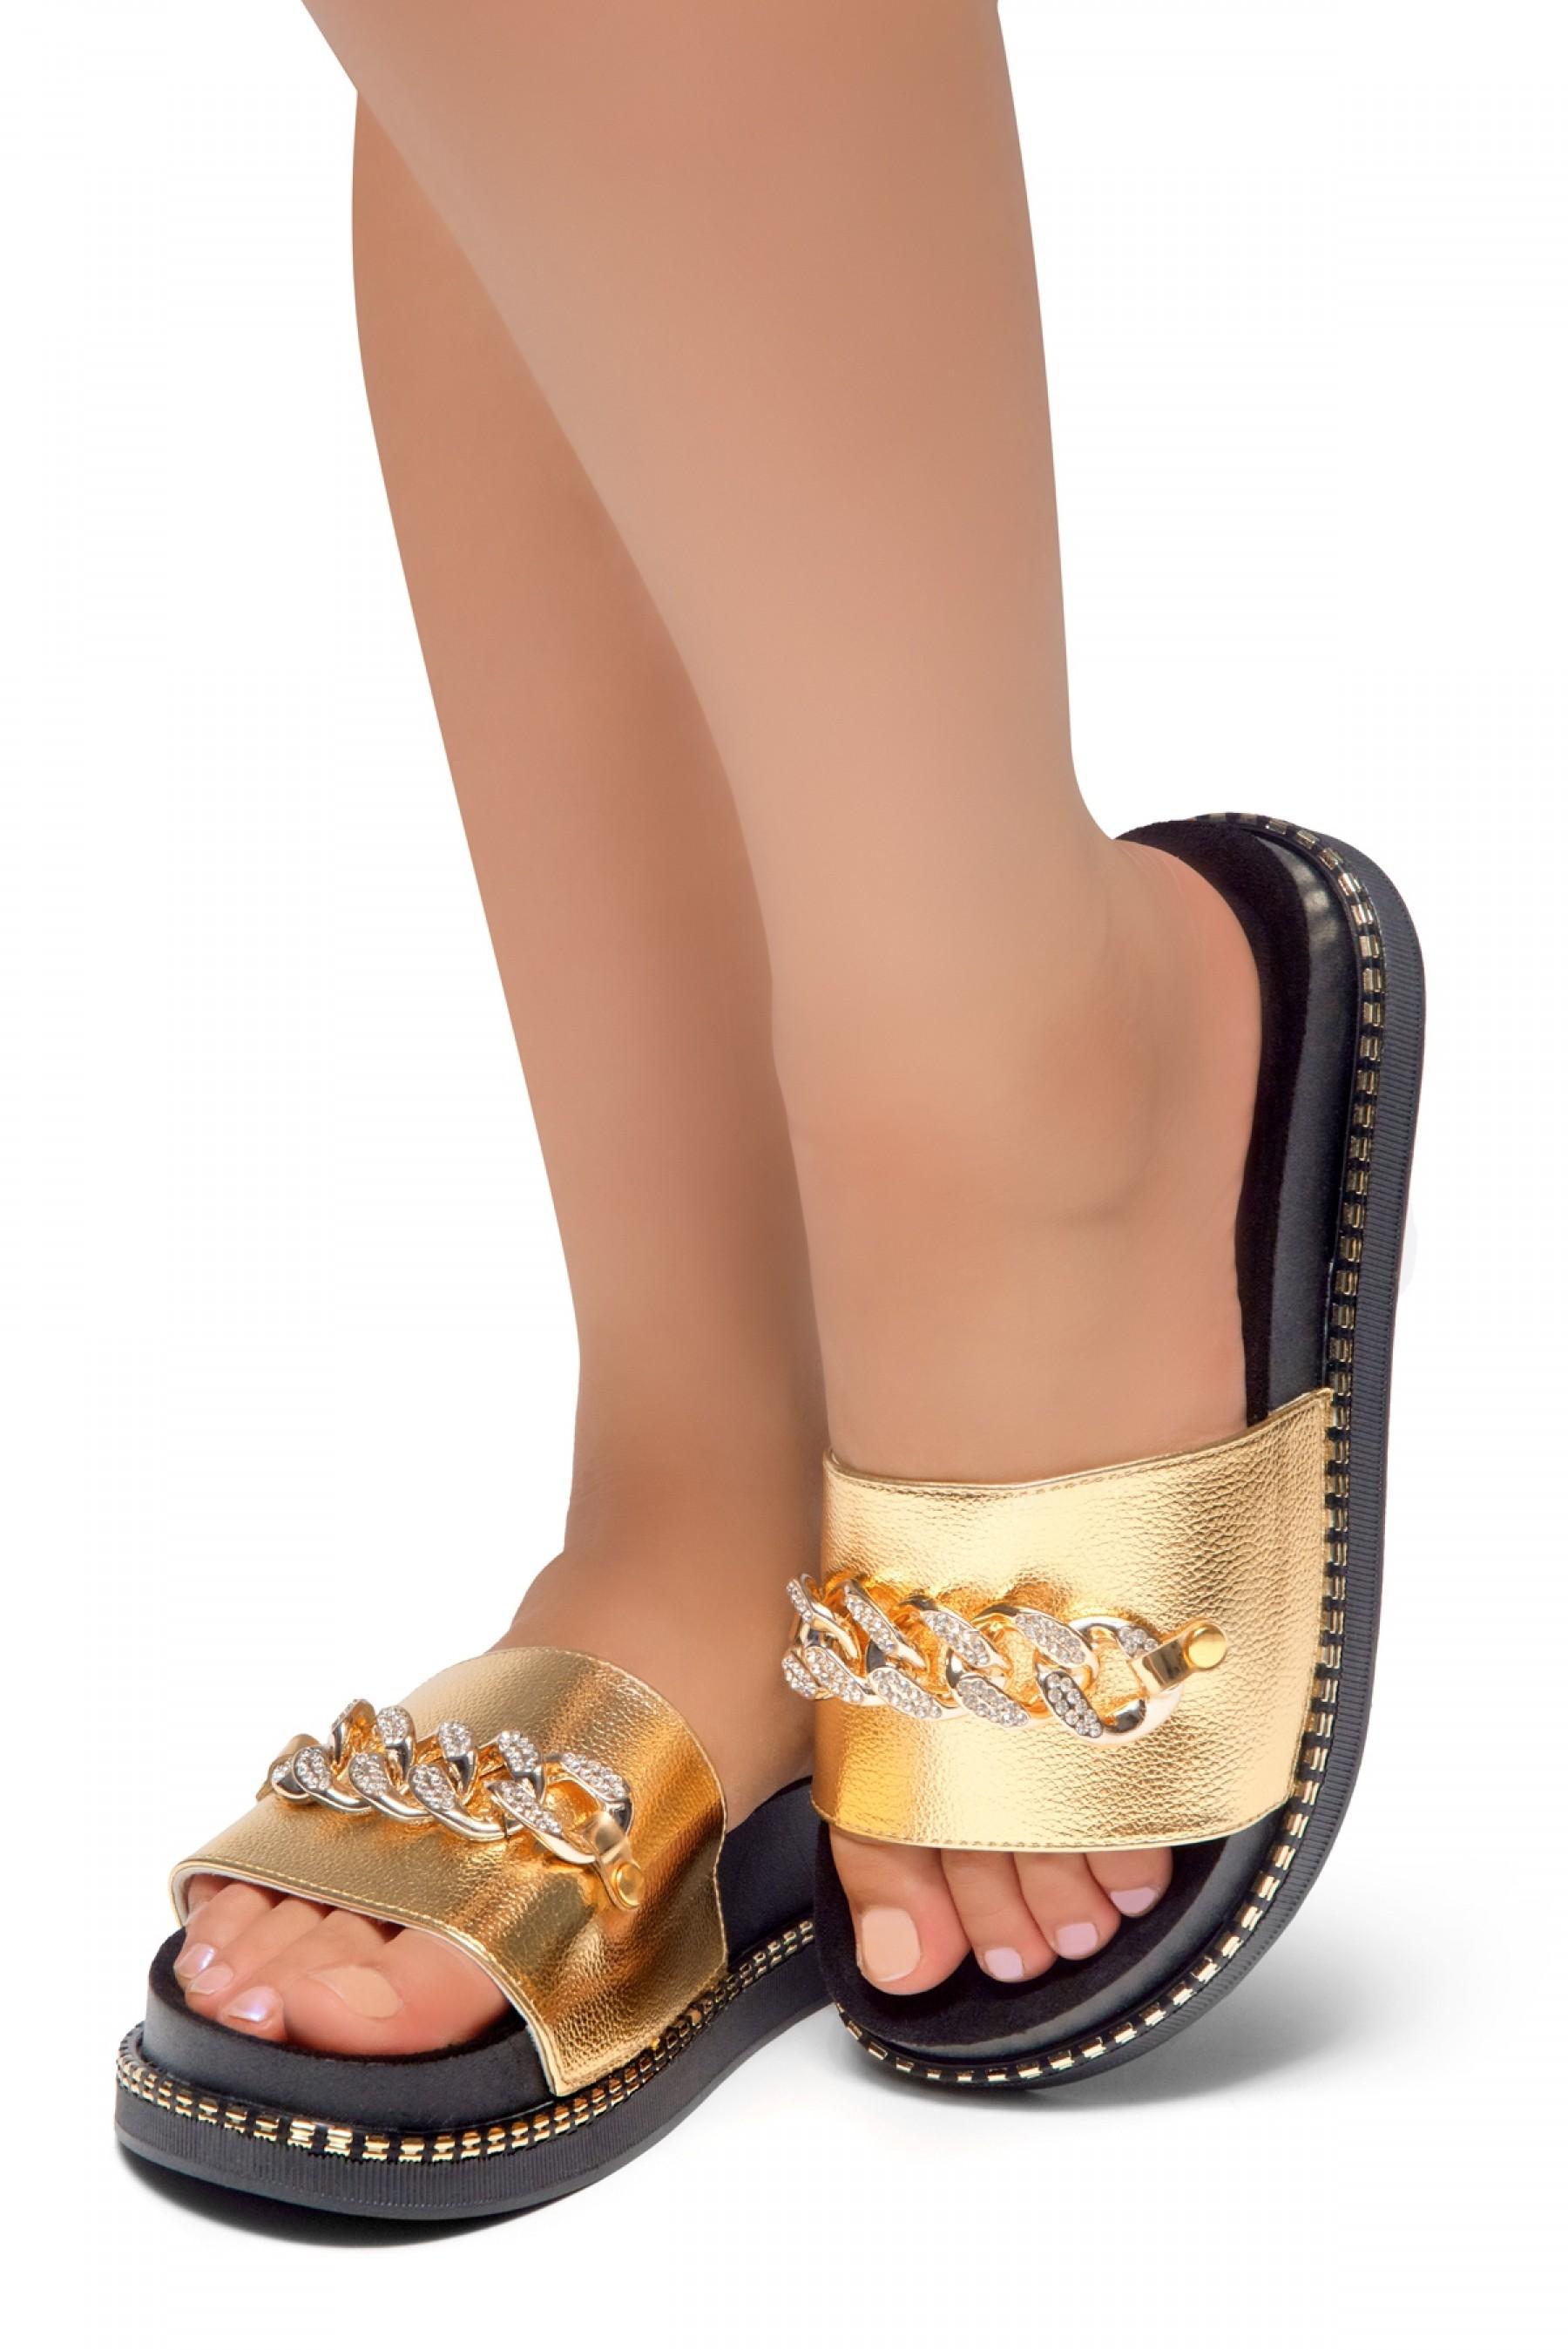 66f2cbeb5f18 HerStyle ORA-Open Toe Slide Sandal with Rhinestone Metallic Chain ...